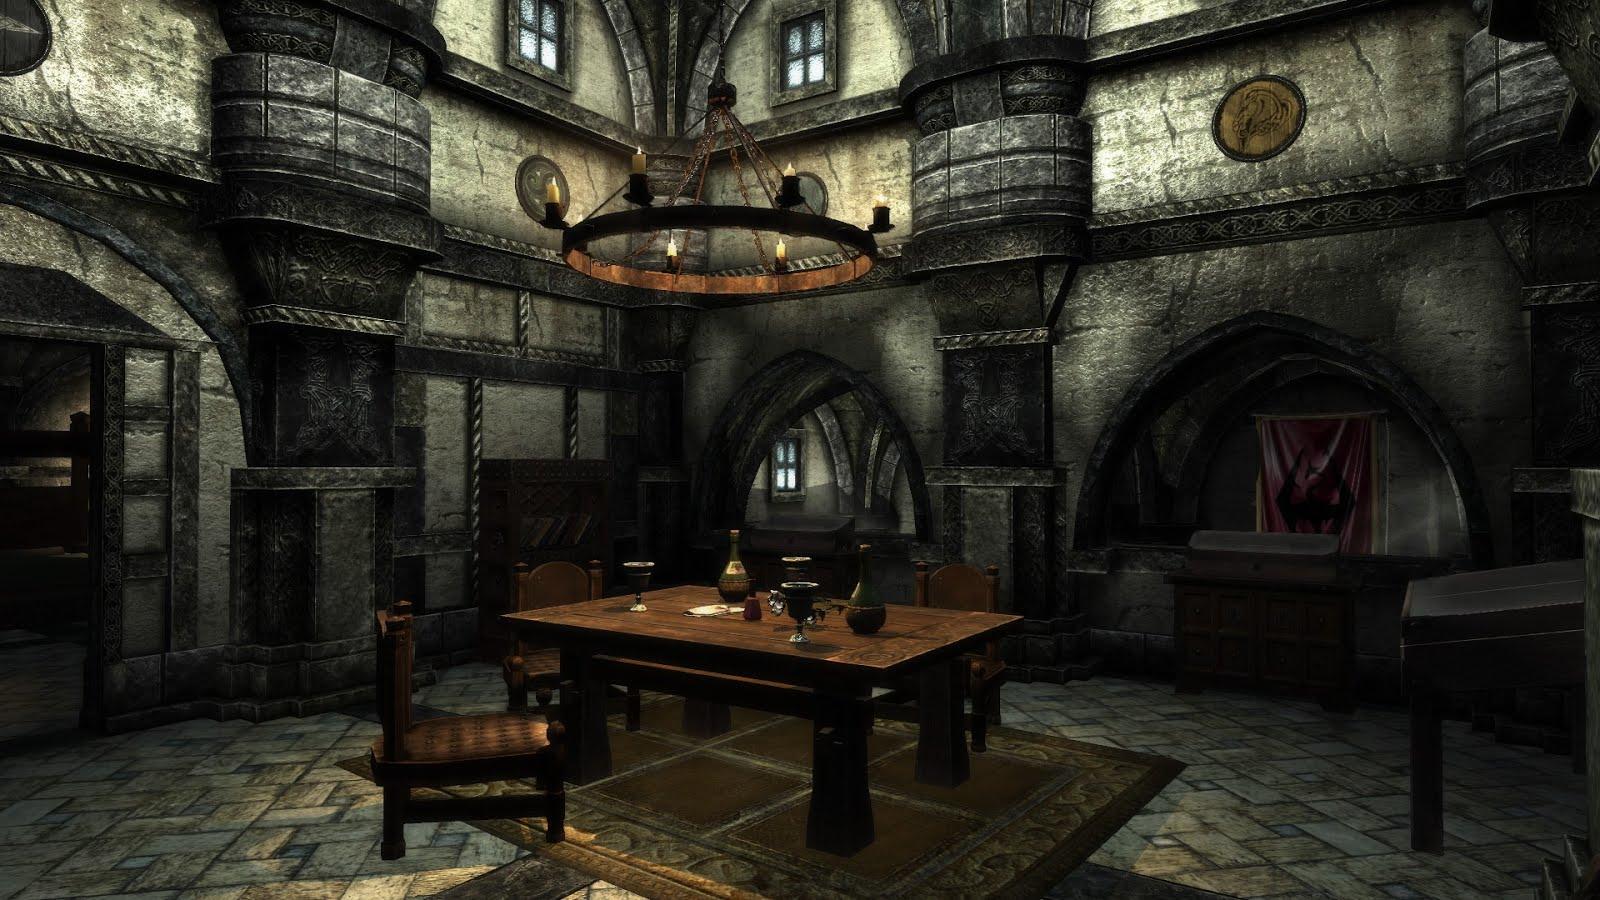 Martin James Mods: Skyrim - Player Home Overhauls